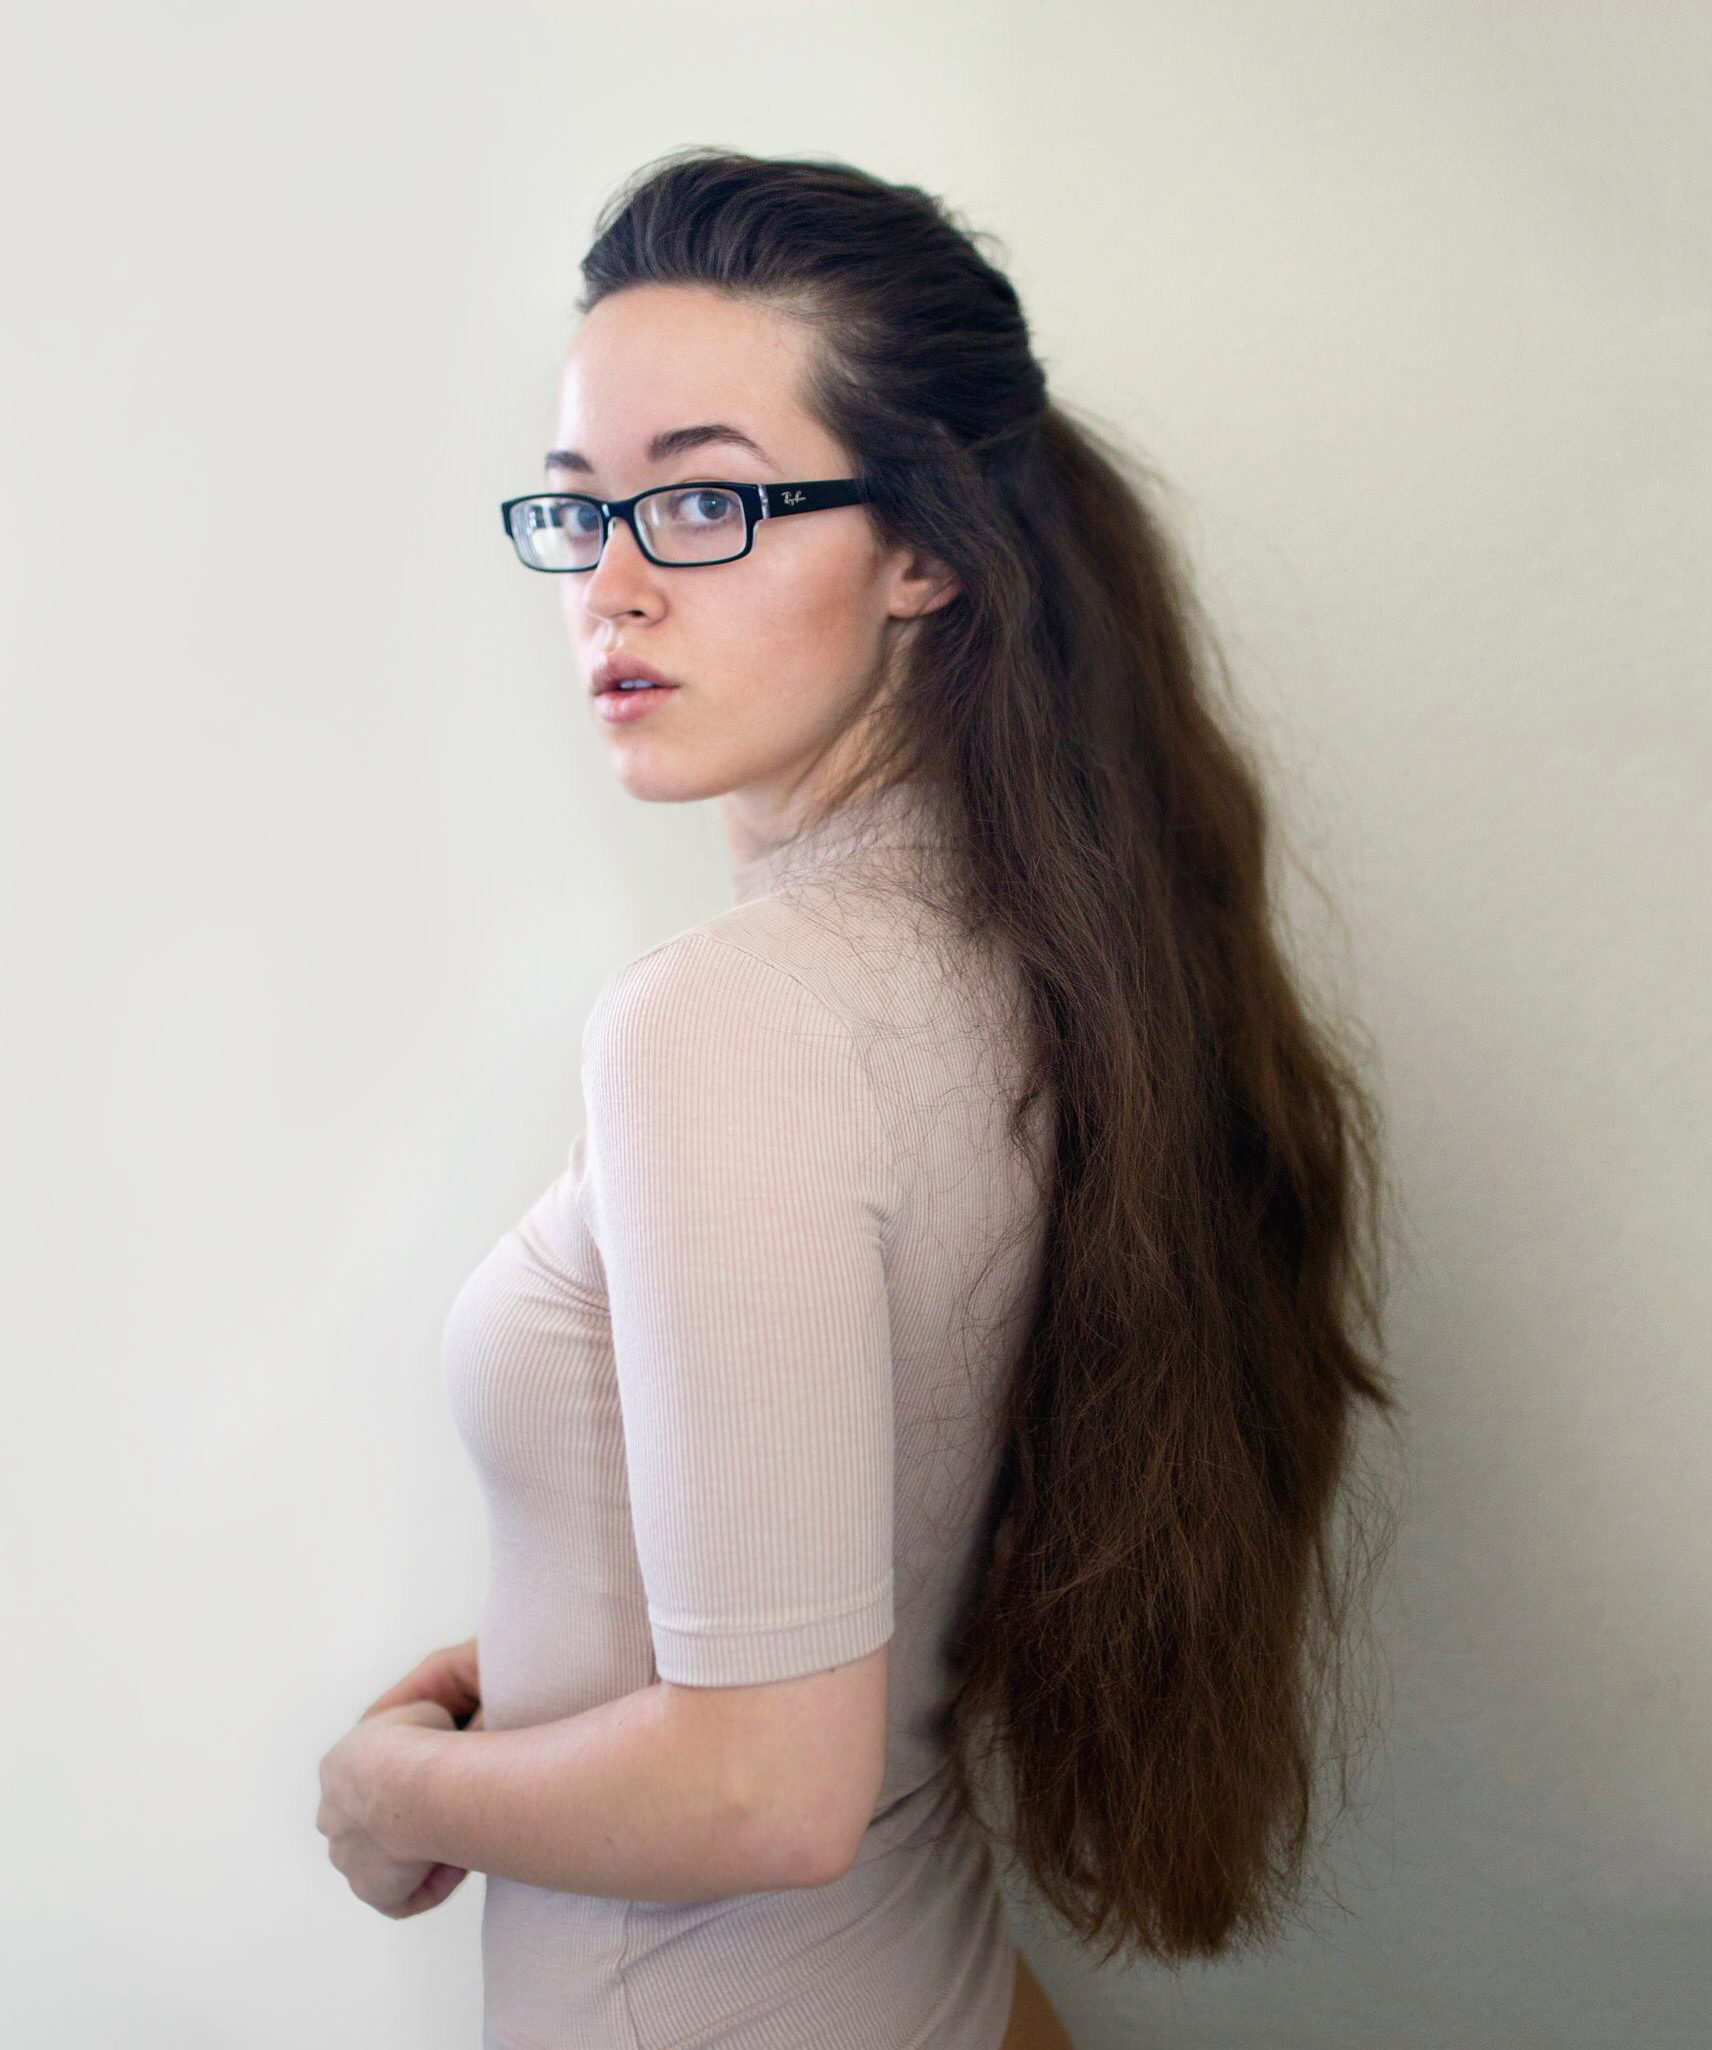 Self portrait, pose, female poses, hair